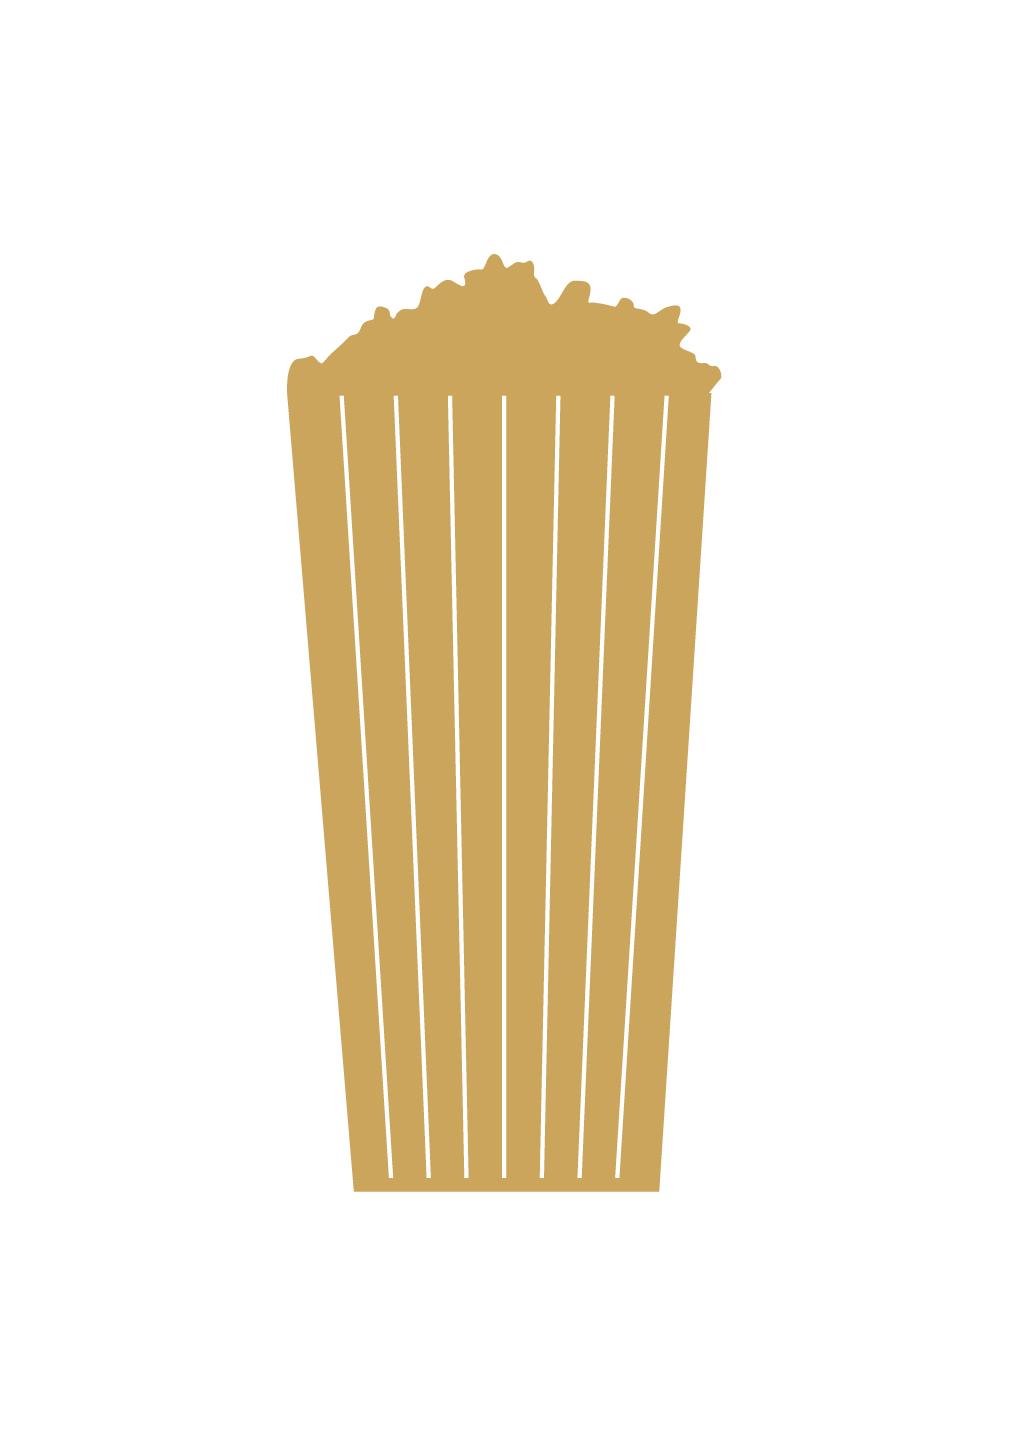 popcorn-icon.png